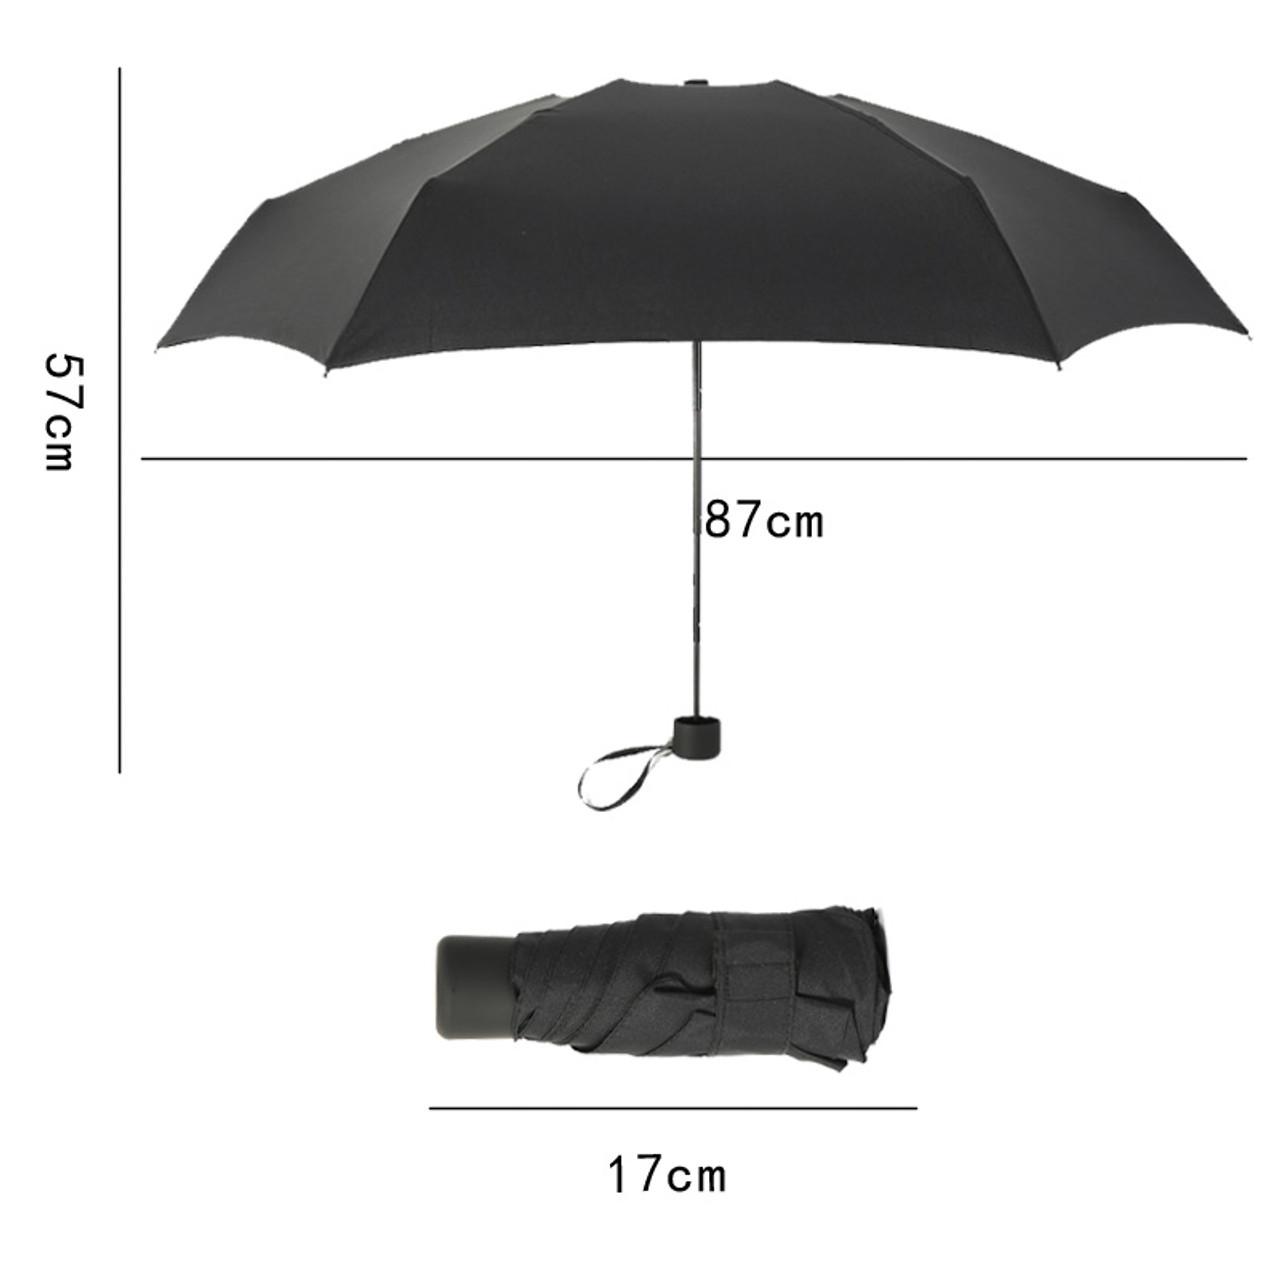 55e0160de7c9 180g Small Fashion Folding Umbrella Rain Women Gift Men Mini Pocket Parasol  Girls Anti-UV Waterproof Portable Travel UMBRELLAS